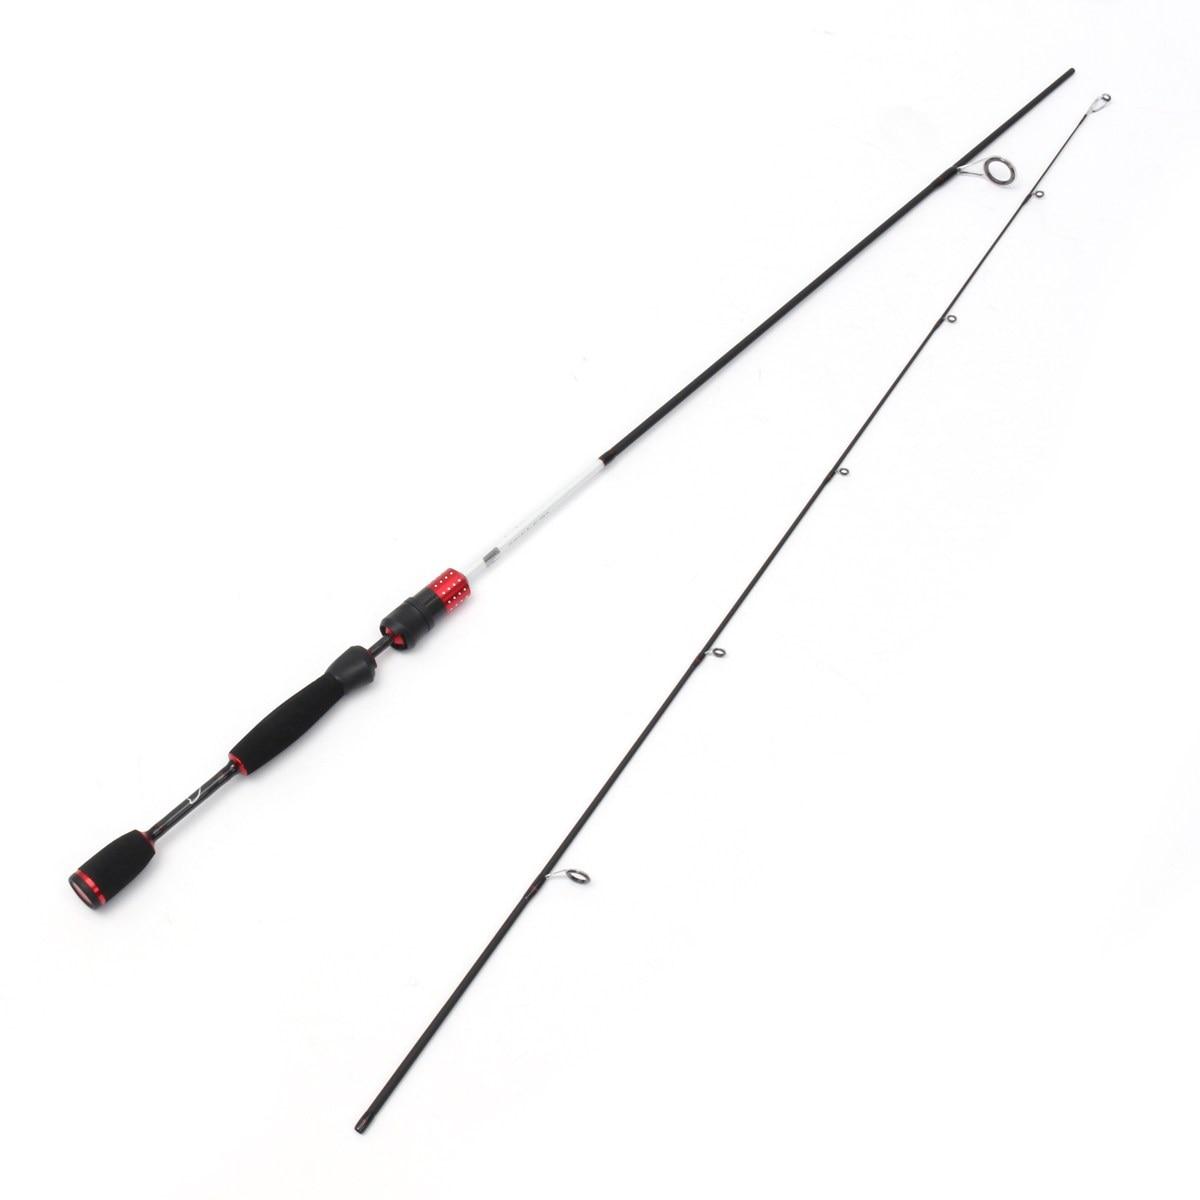 Bobing Gong-Ji 1.8m Carbon Fiber 2 Section Lure Rod Carp Spinning Casting Fishing Rod Pole 1-5g Lure 2-6lb Line Capacity L Power okuma genuine brake renault c3 1 83 m 1 98 m 2 13 m m tune grips road asia rod fishing rod inserted section pole